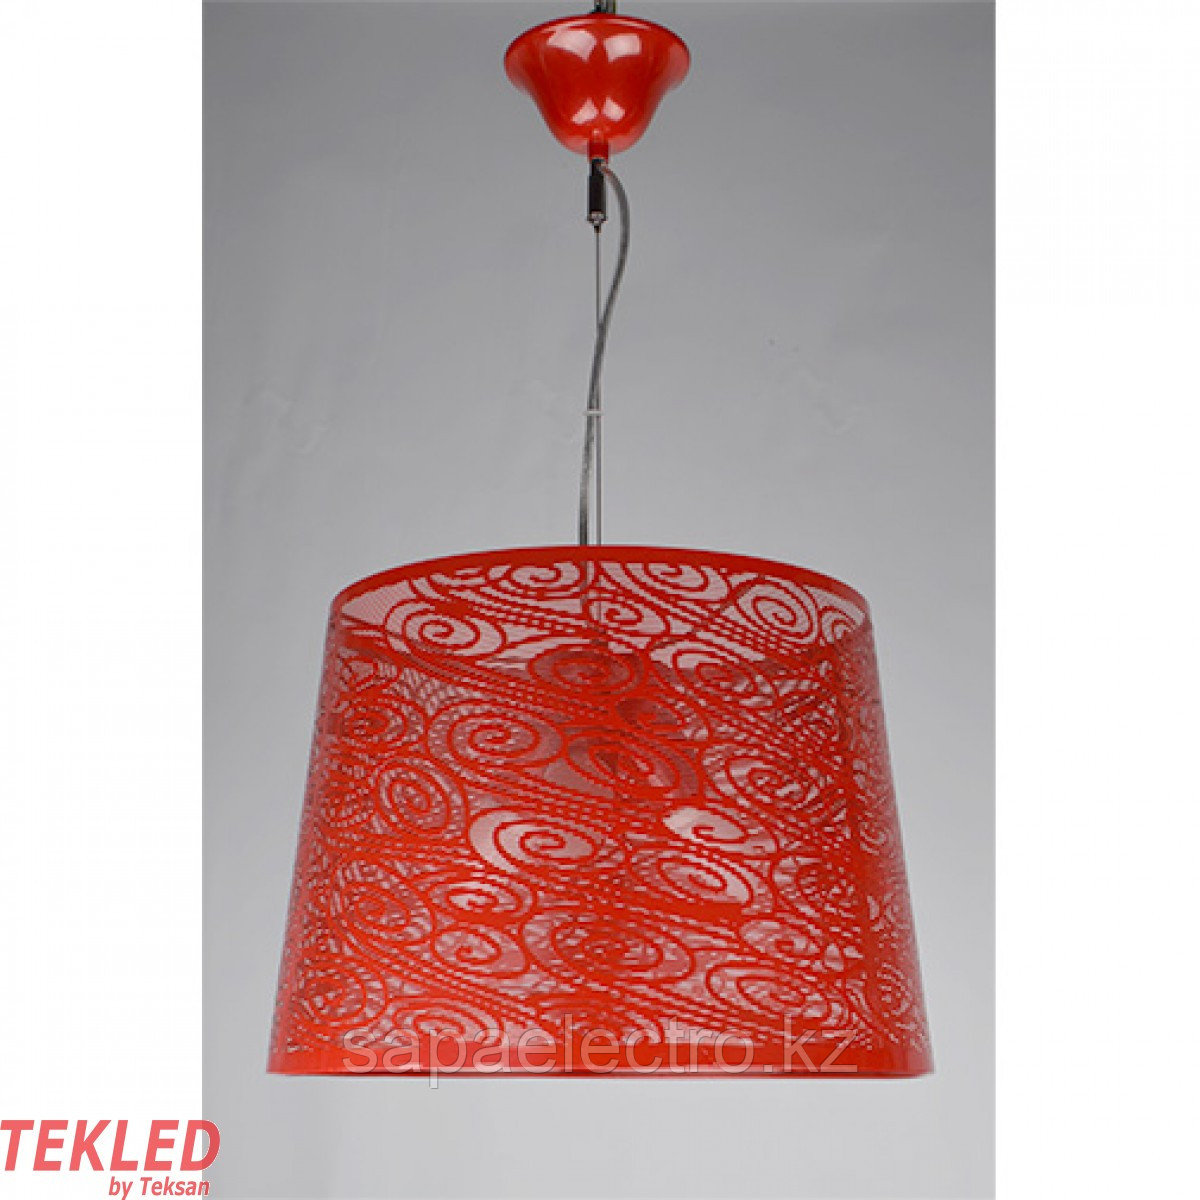 Свет-к T282/3L 3XE27 60W RED (ASYA AVIZE) 1шт